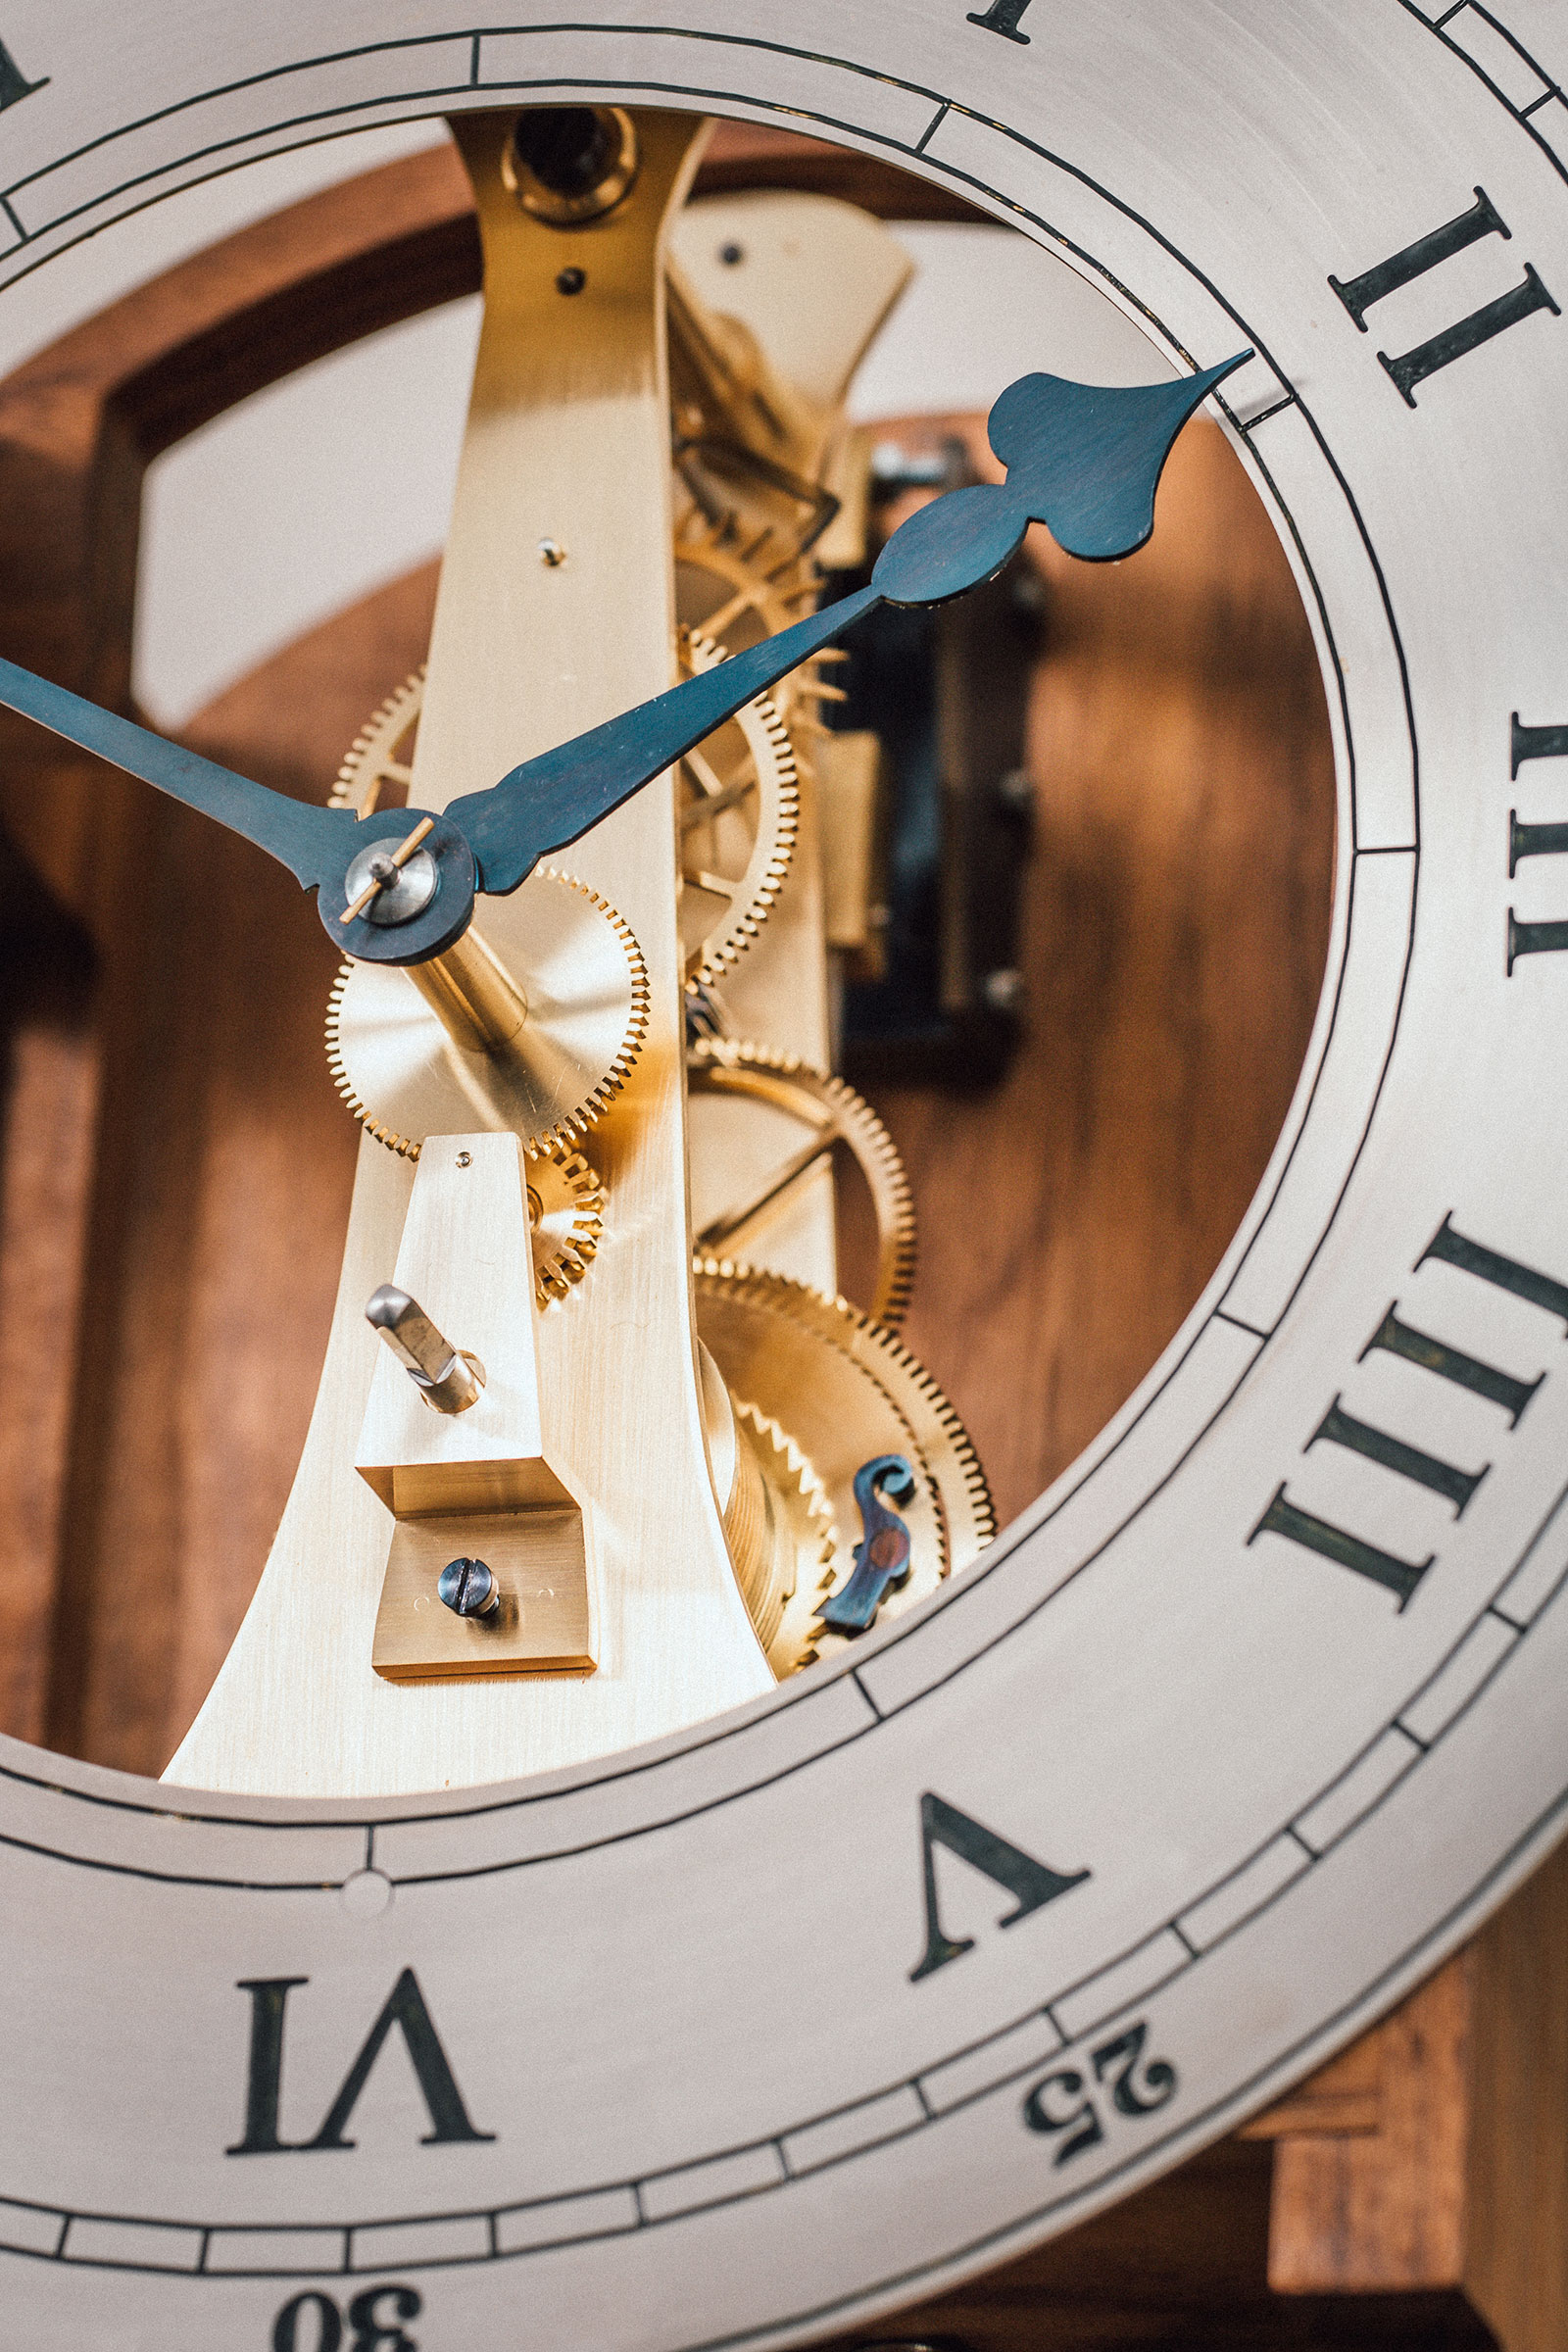 Tyler John Davies clock FP Journe competition 2019 4